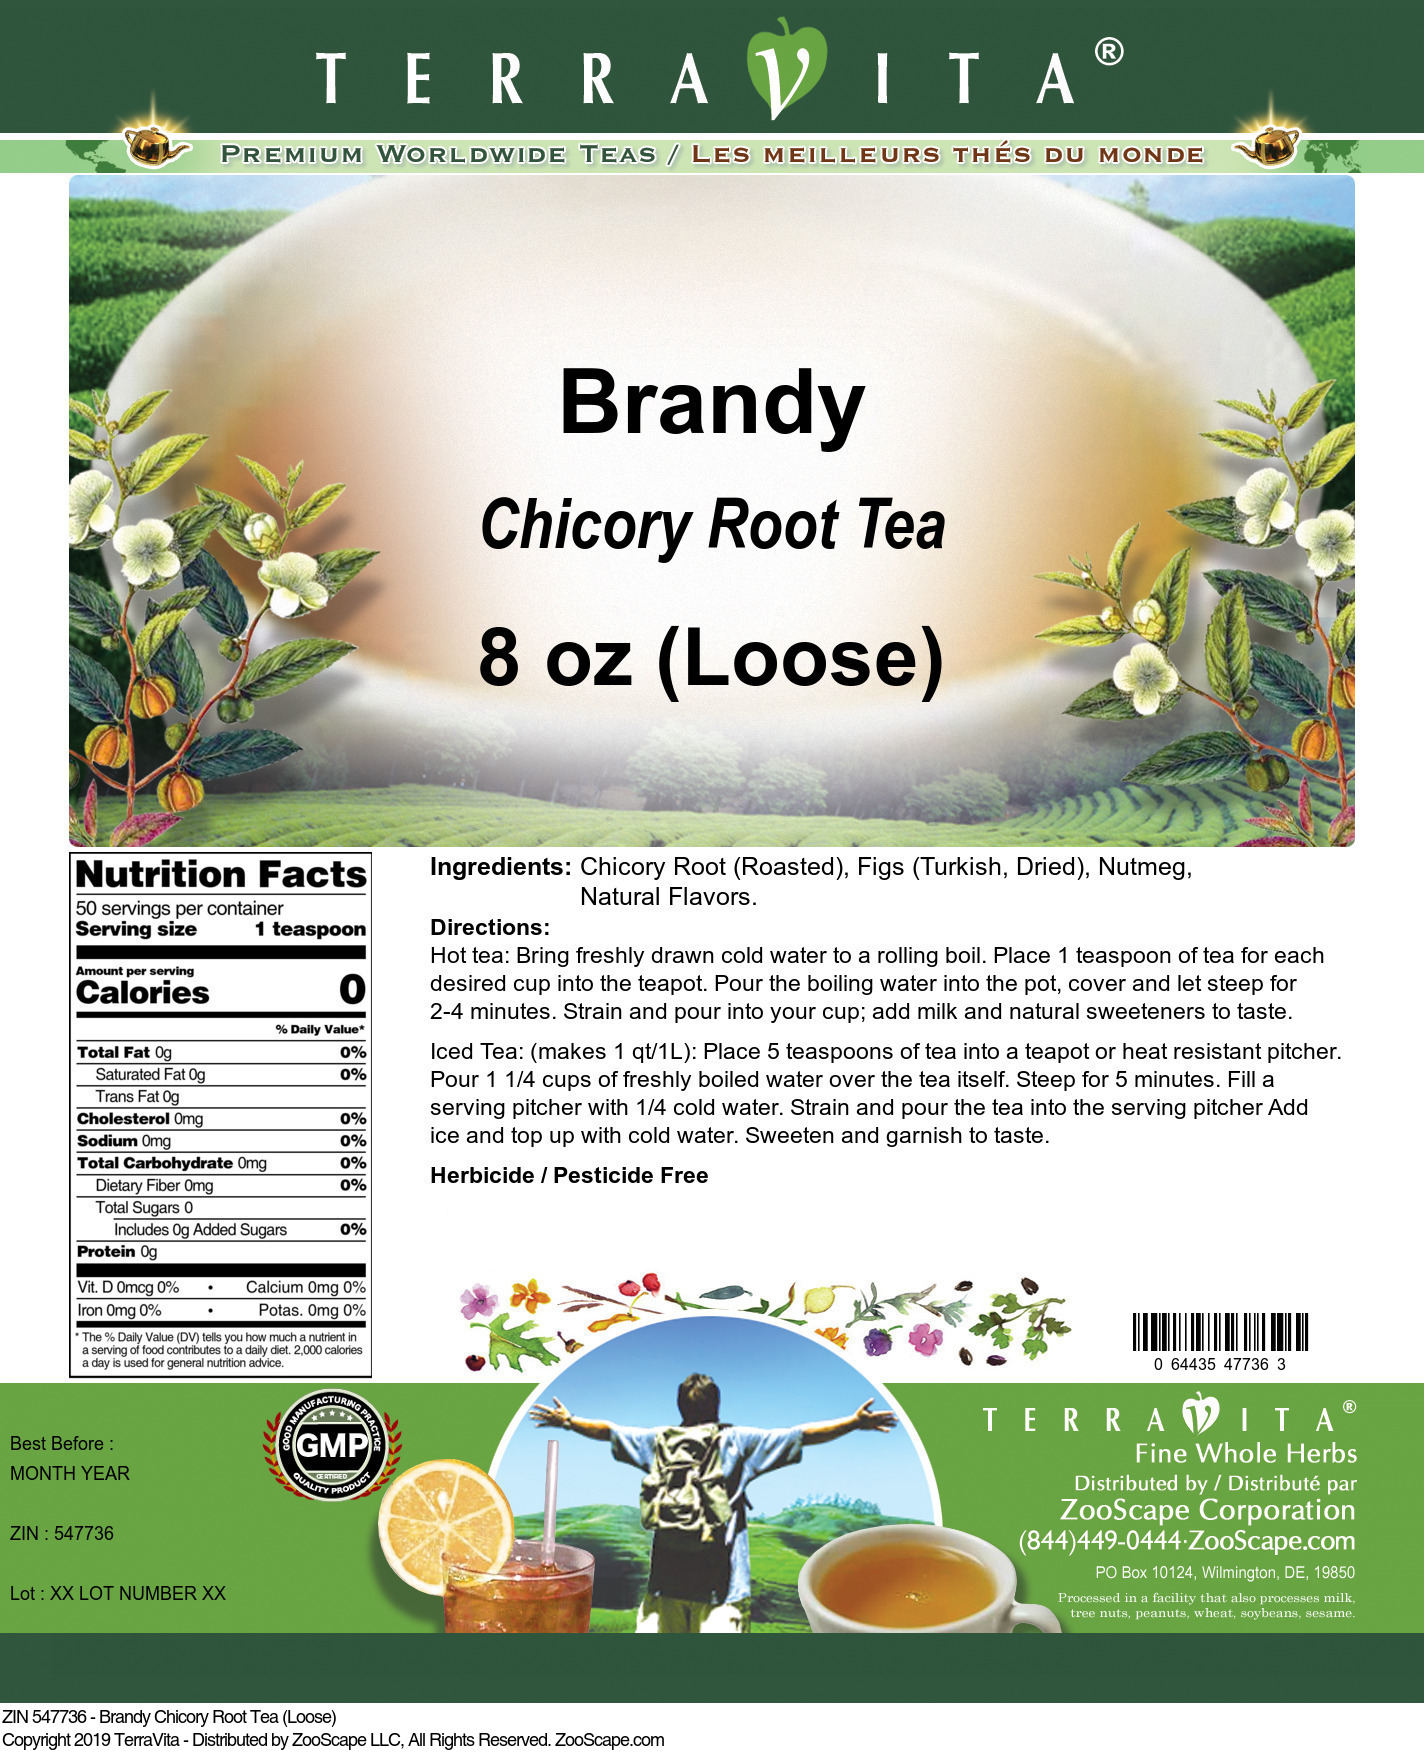 Brandy Chicory Root Tea (Loose)